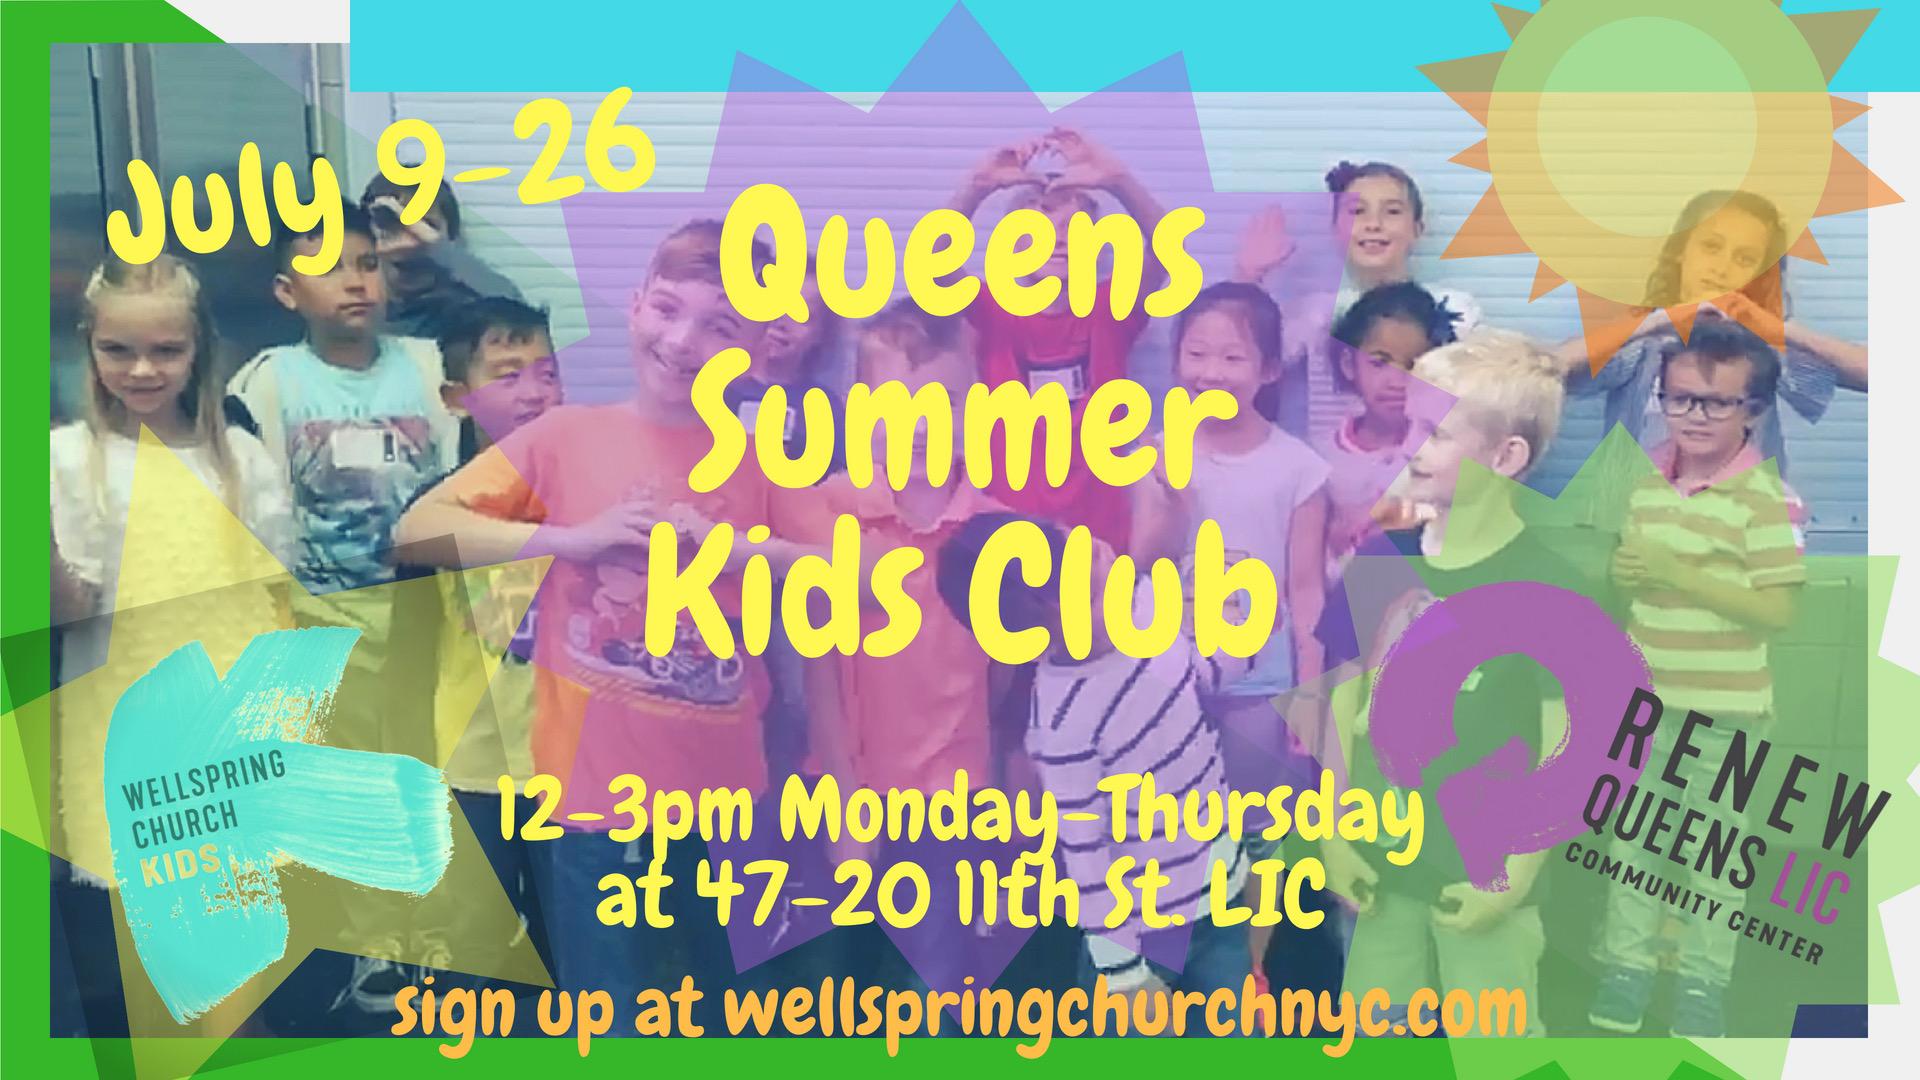 2018.05.29 queens summer kids club slide  1